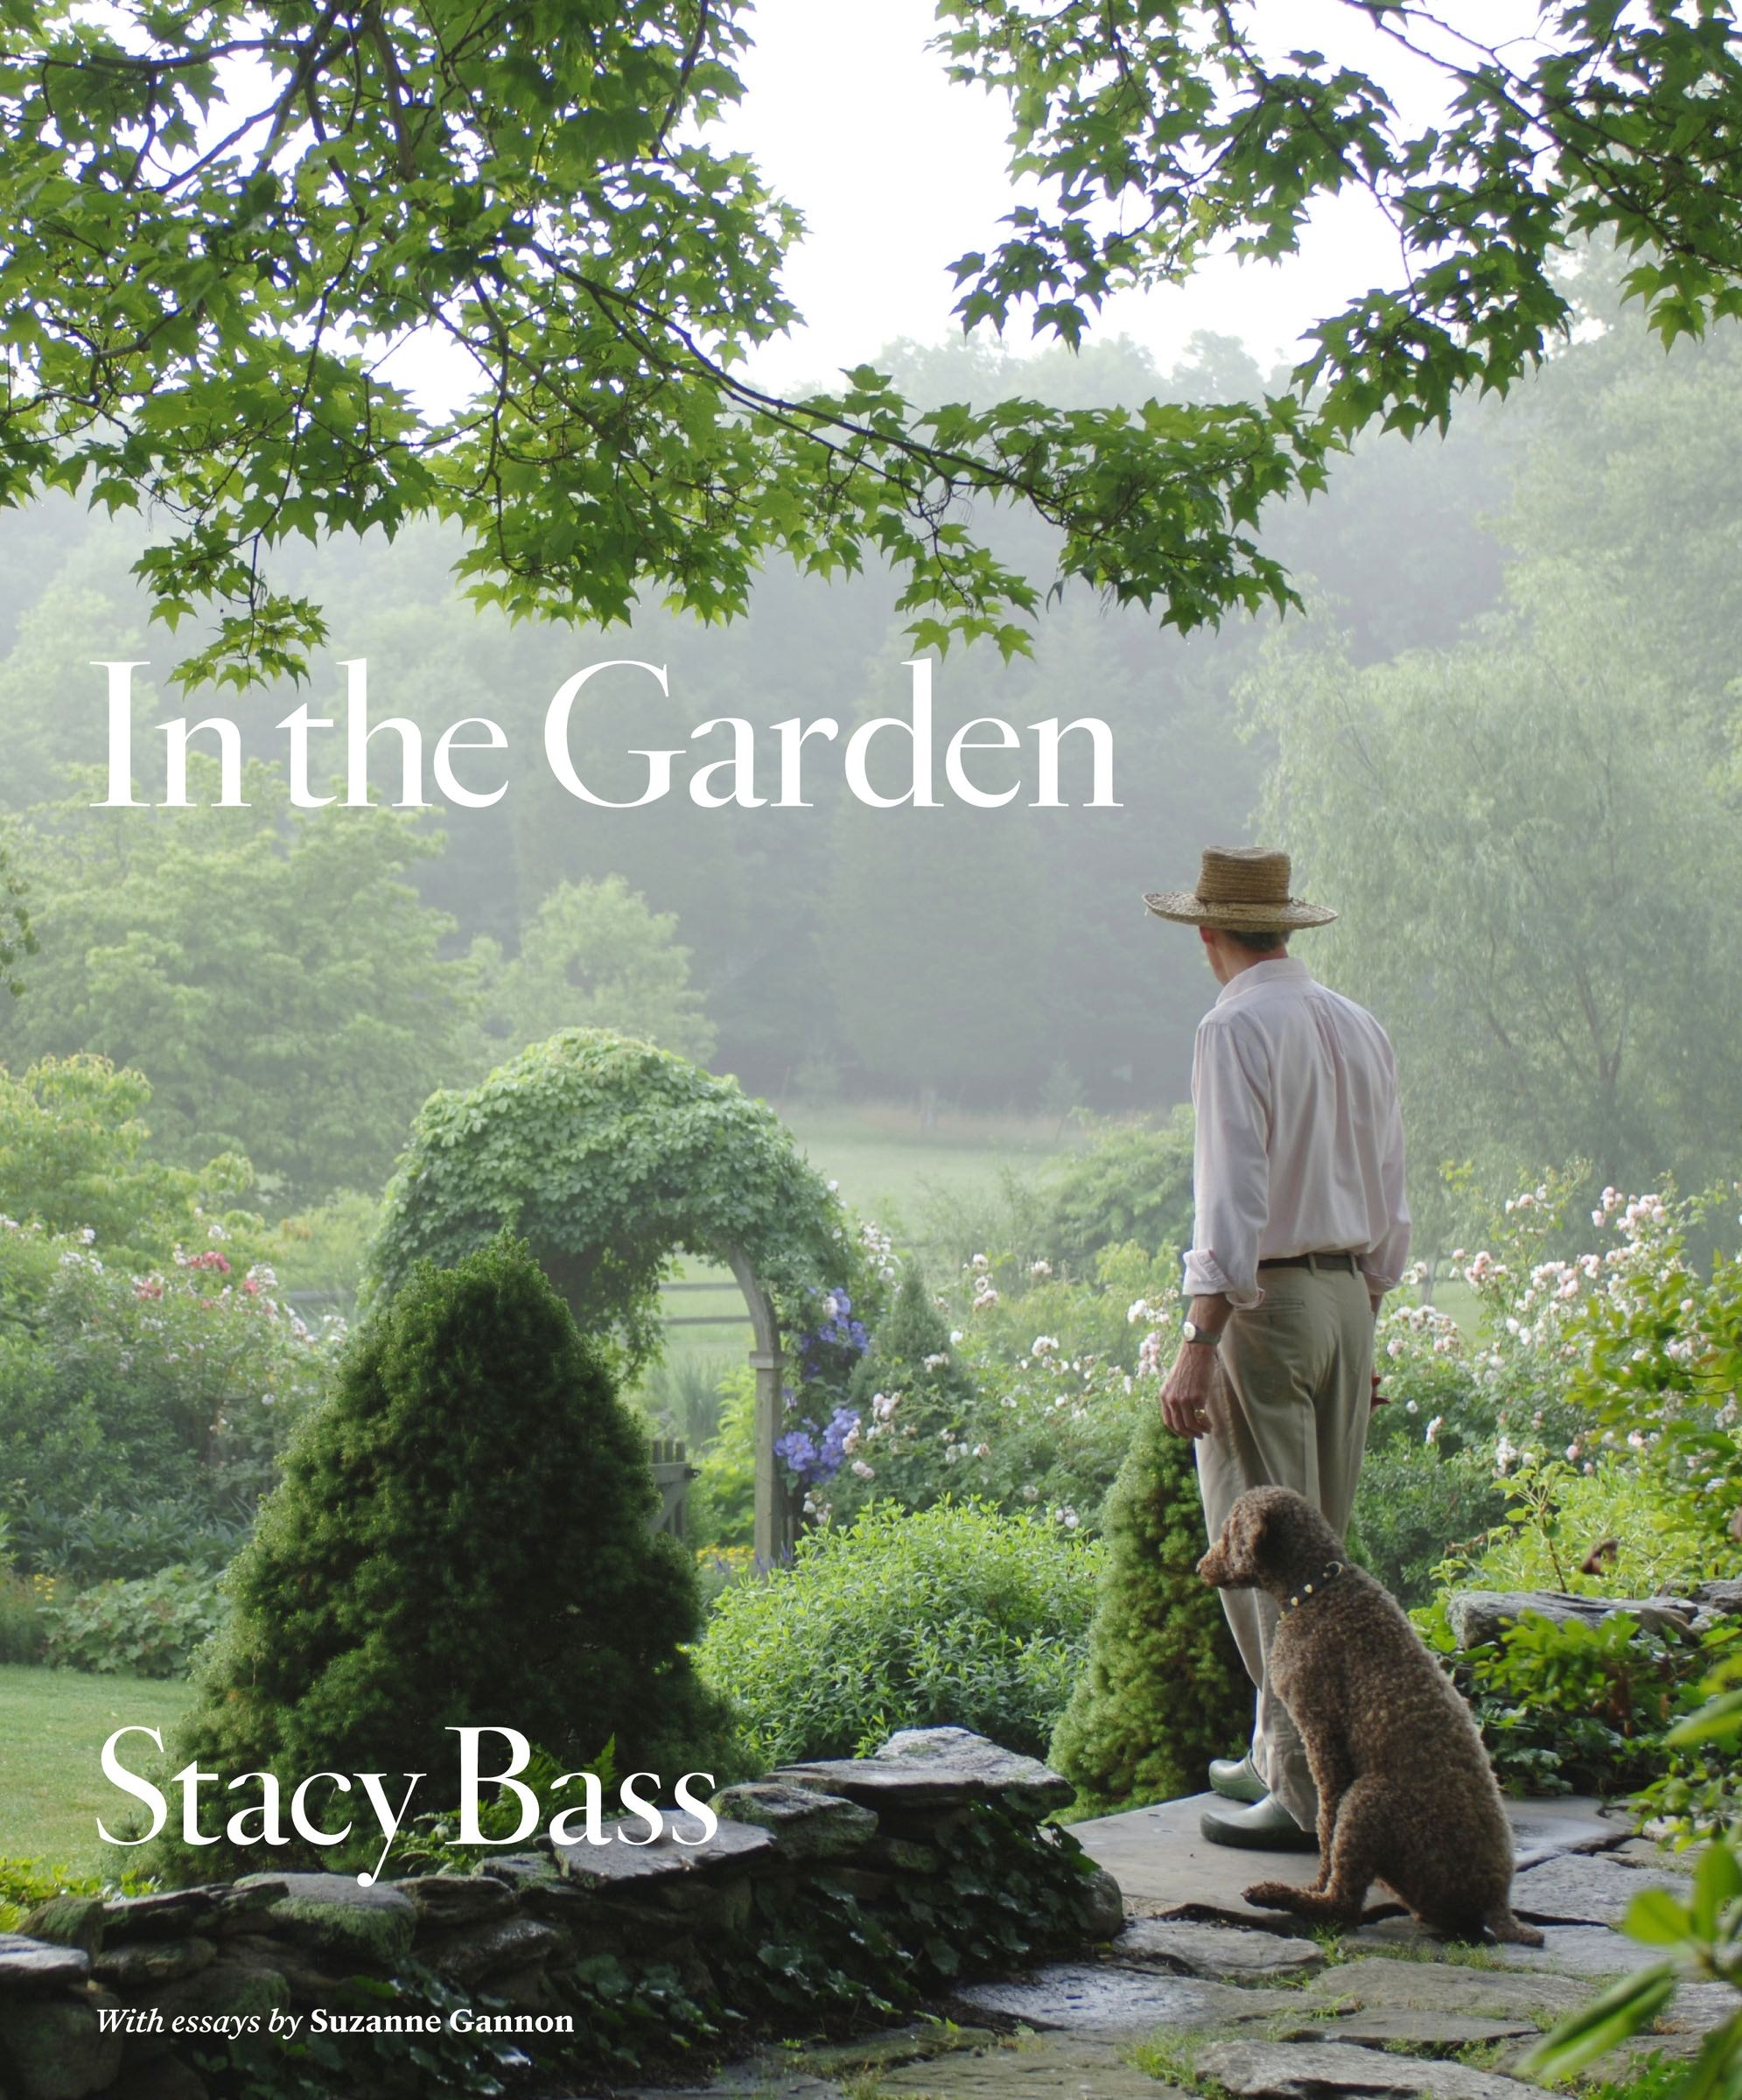 In the Garden COVER.jpg